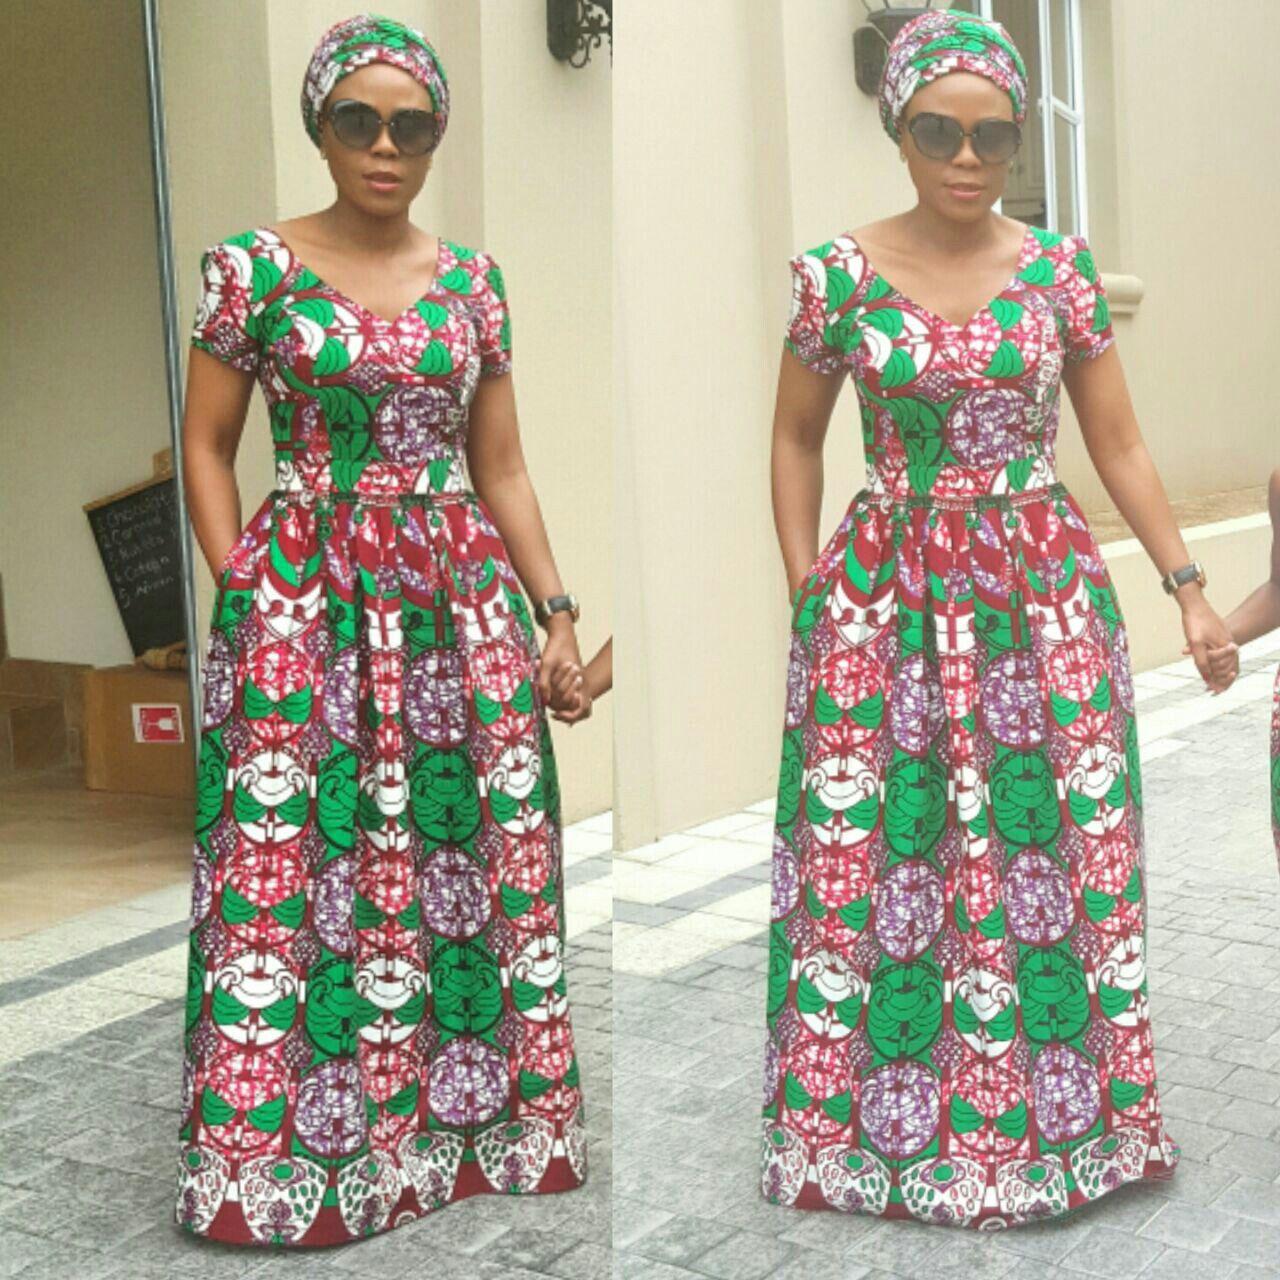 Ankara maxi dress nedim designs nedim designs for Robes maxi design pour les mariages